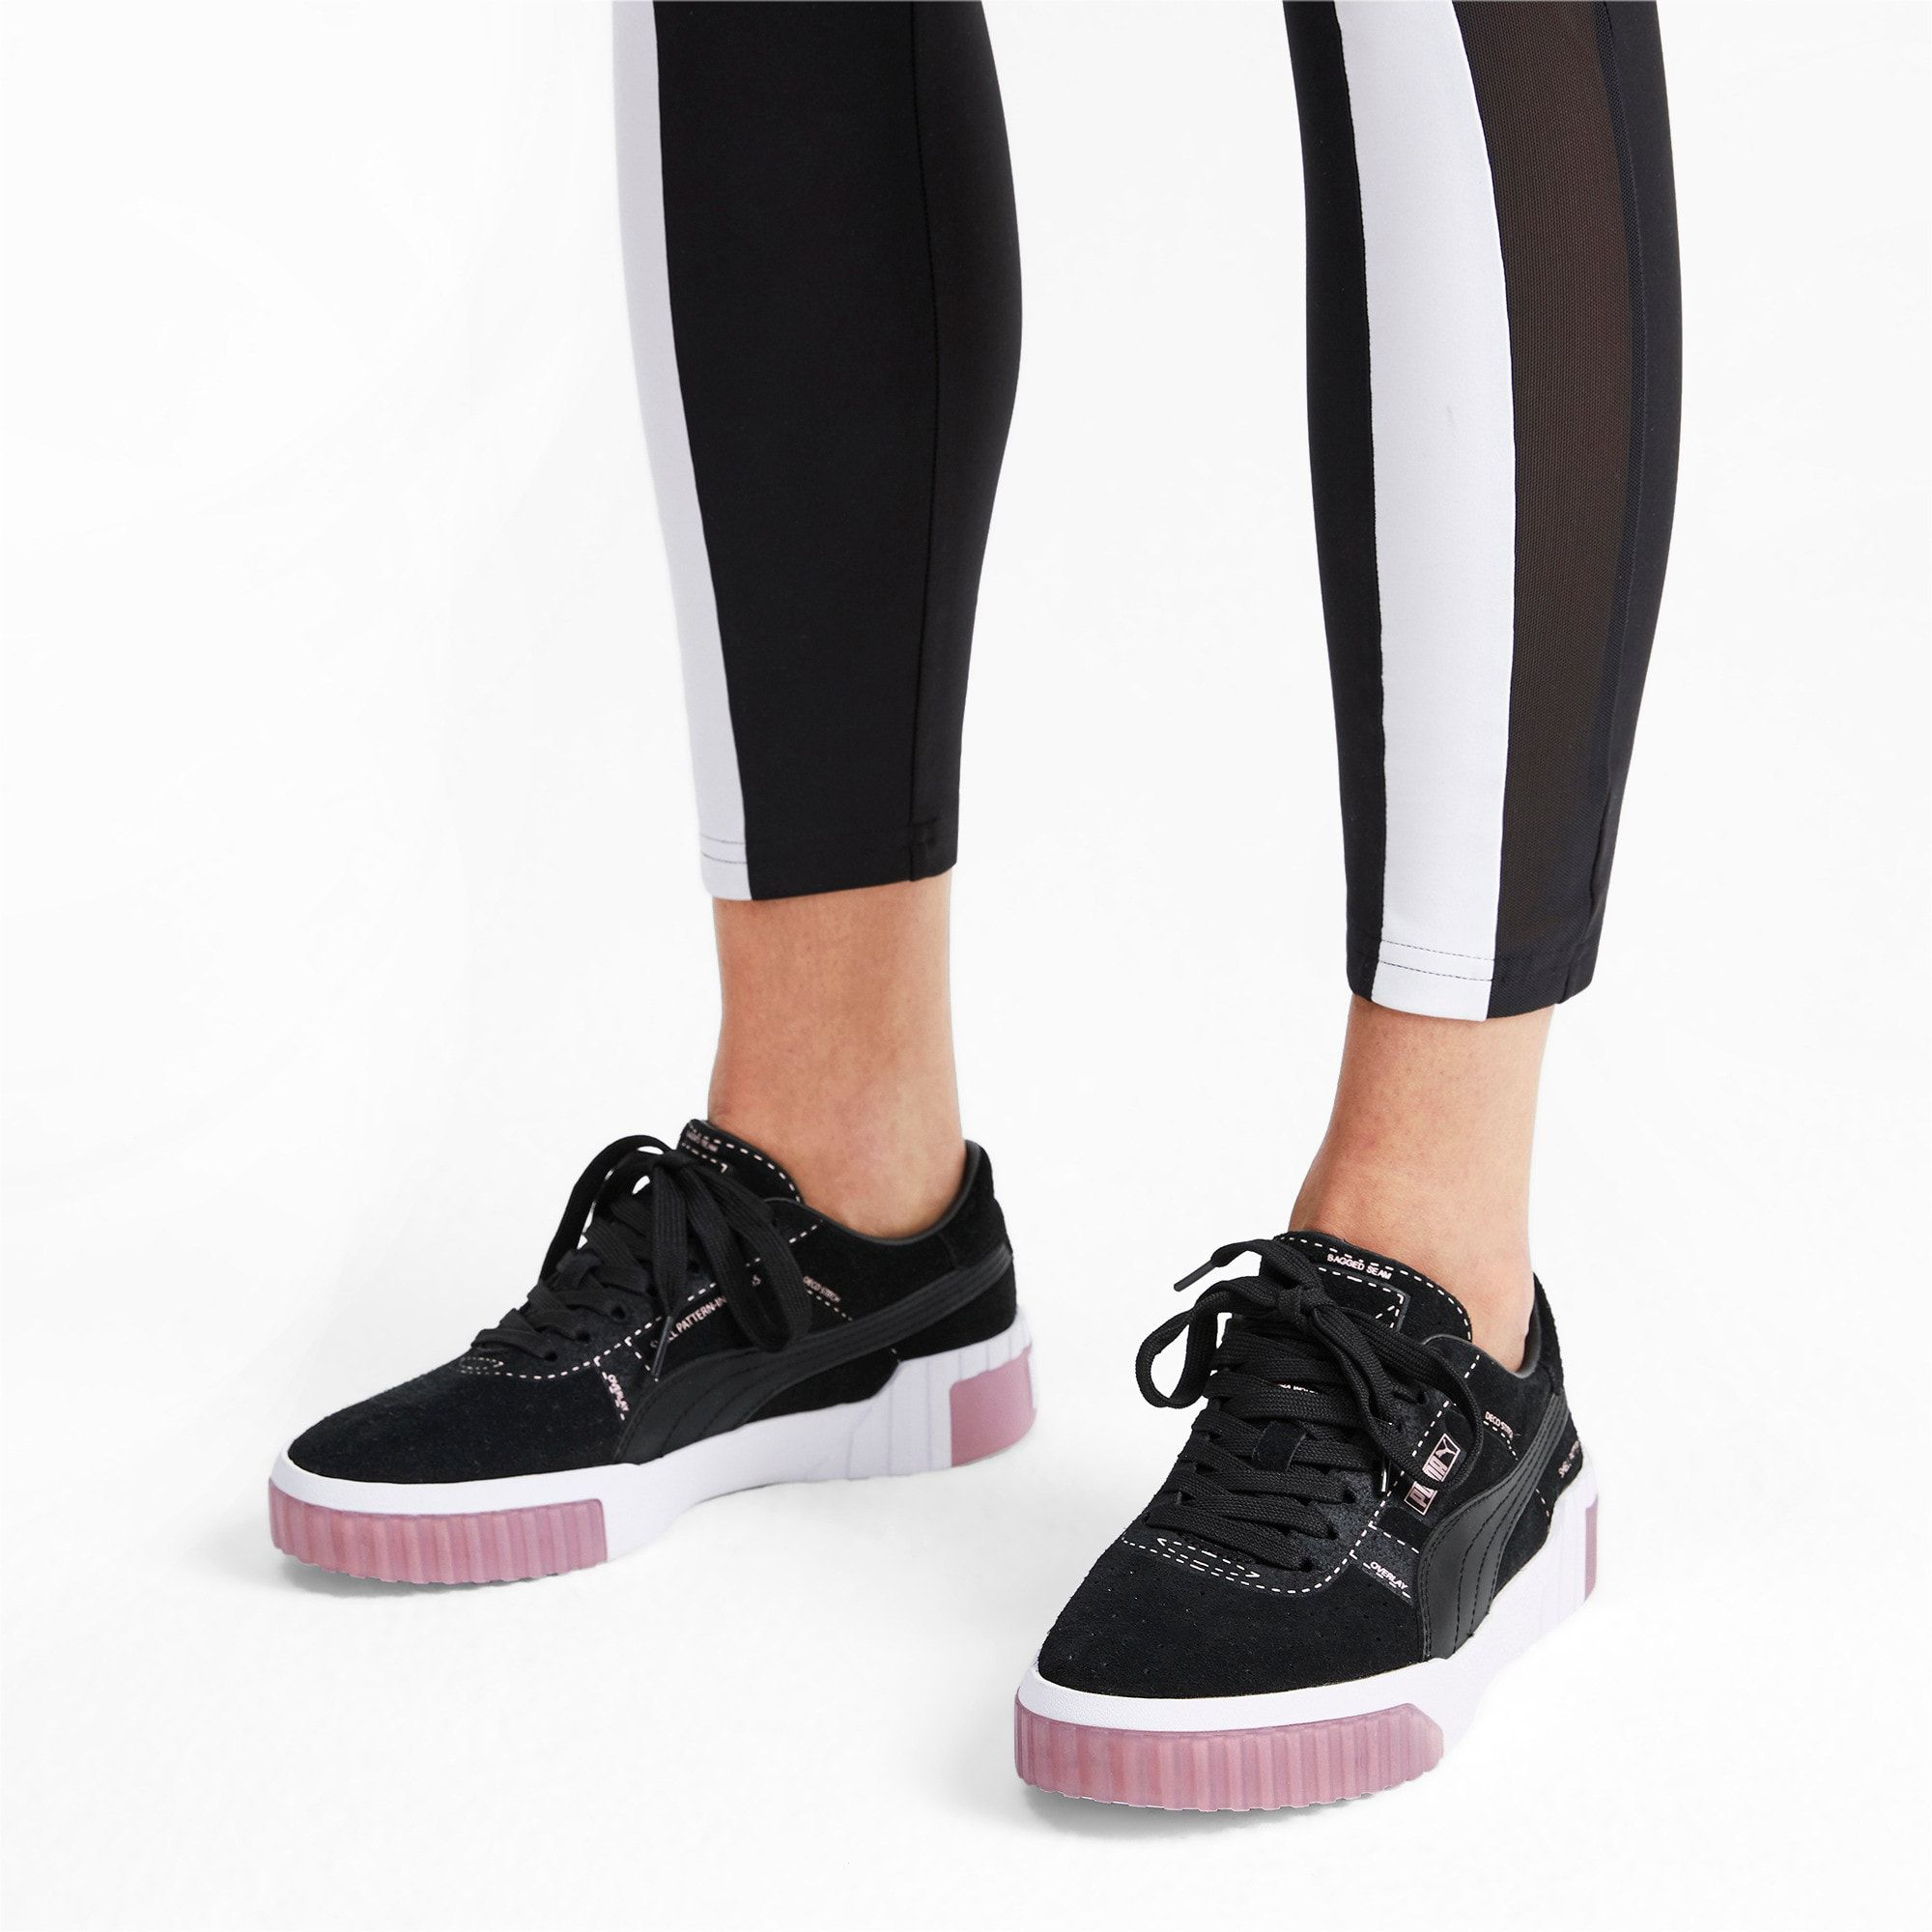 puma basket trainers sale